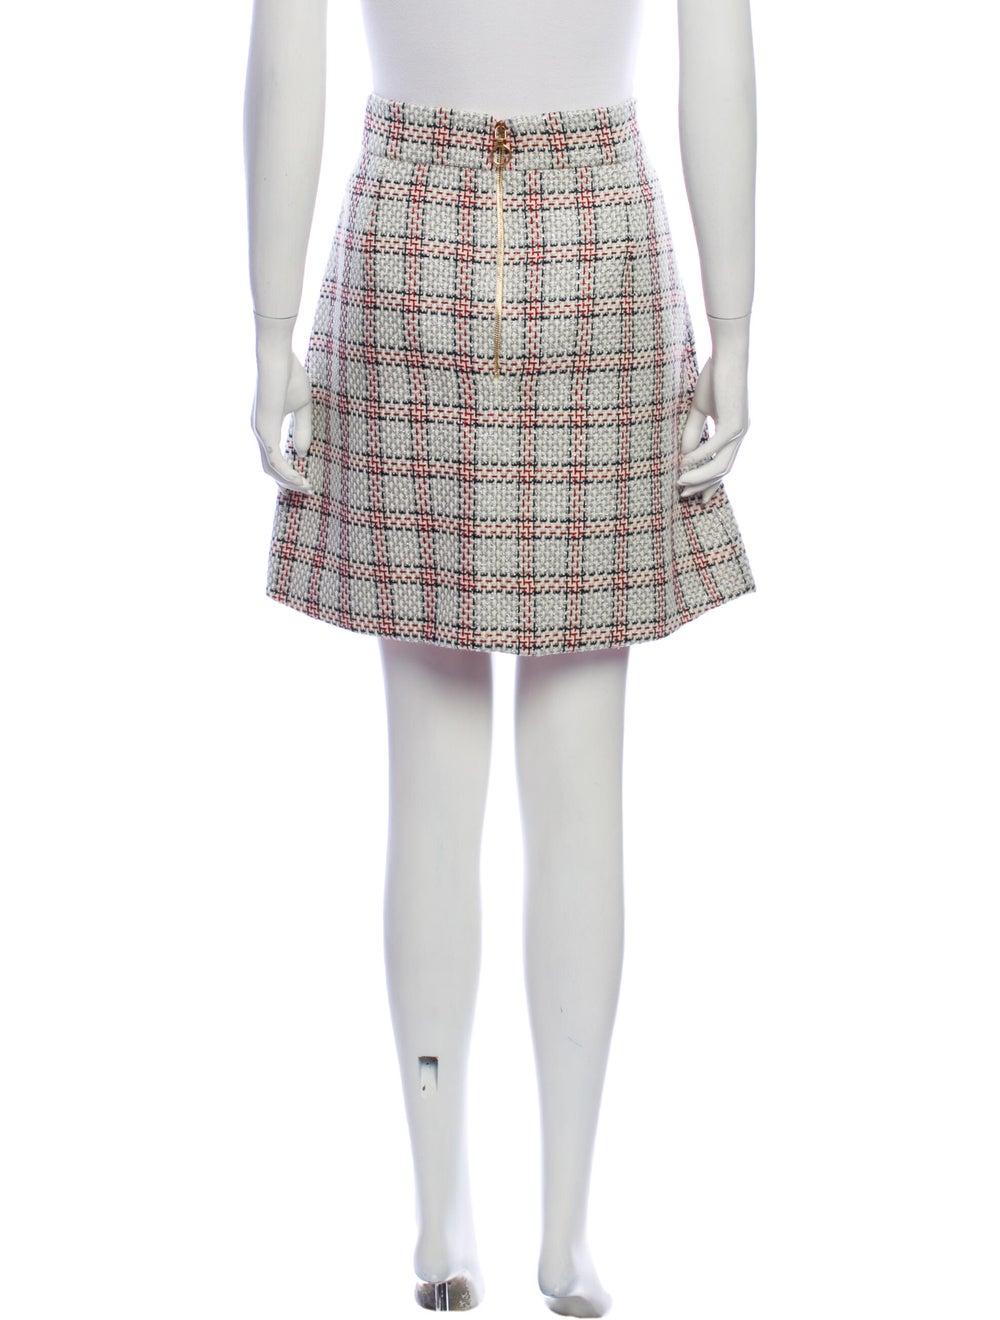 Gucci 2016 Mini Skirt Metallic - image 3